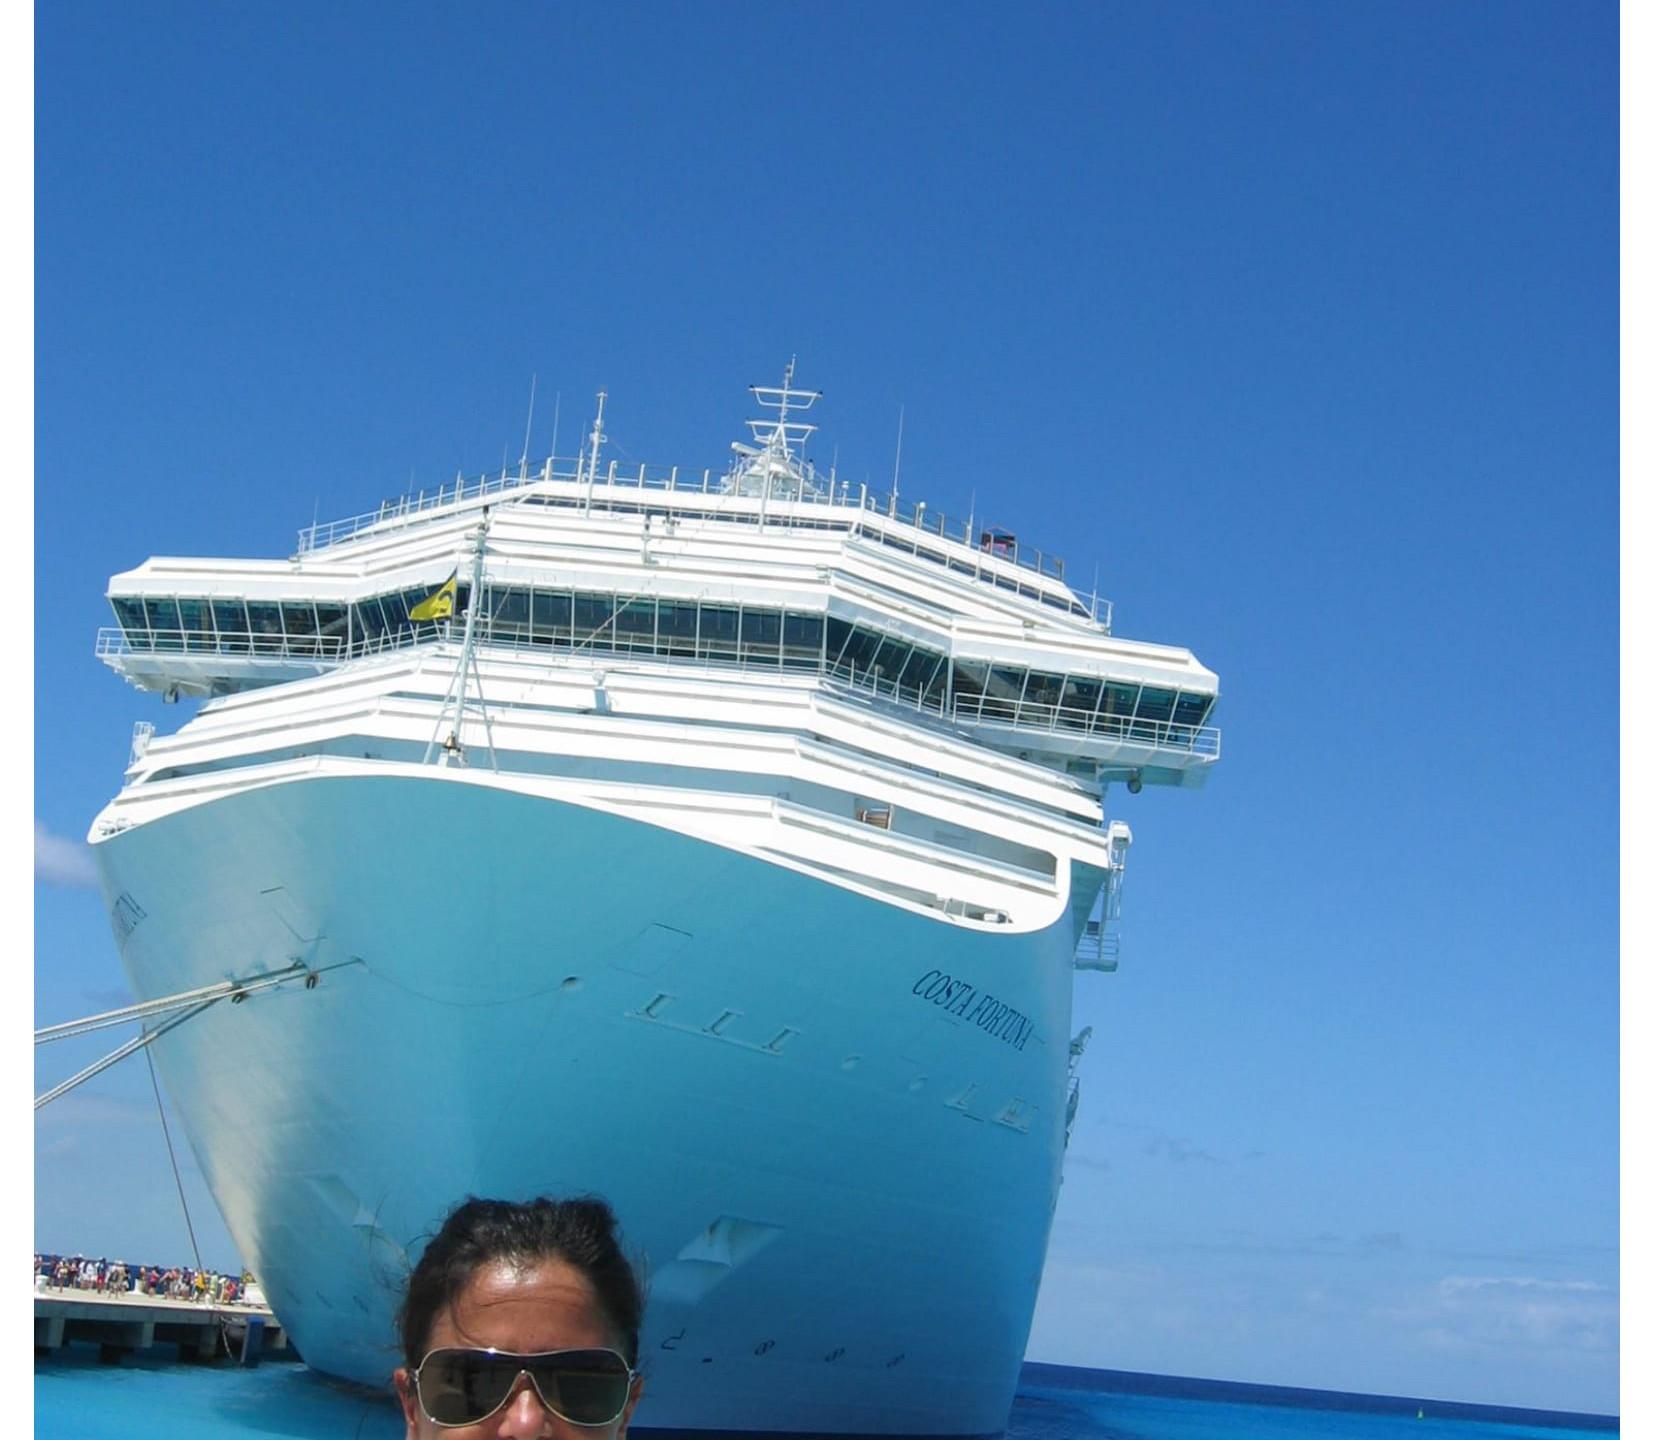 Evelyn goes cruise!